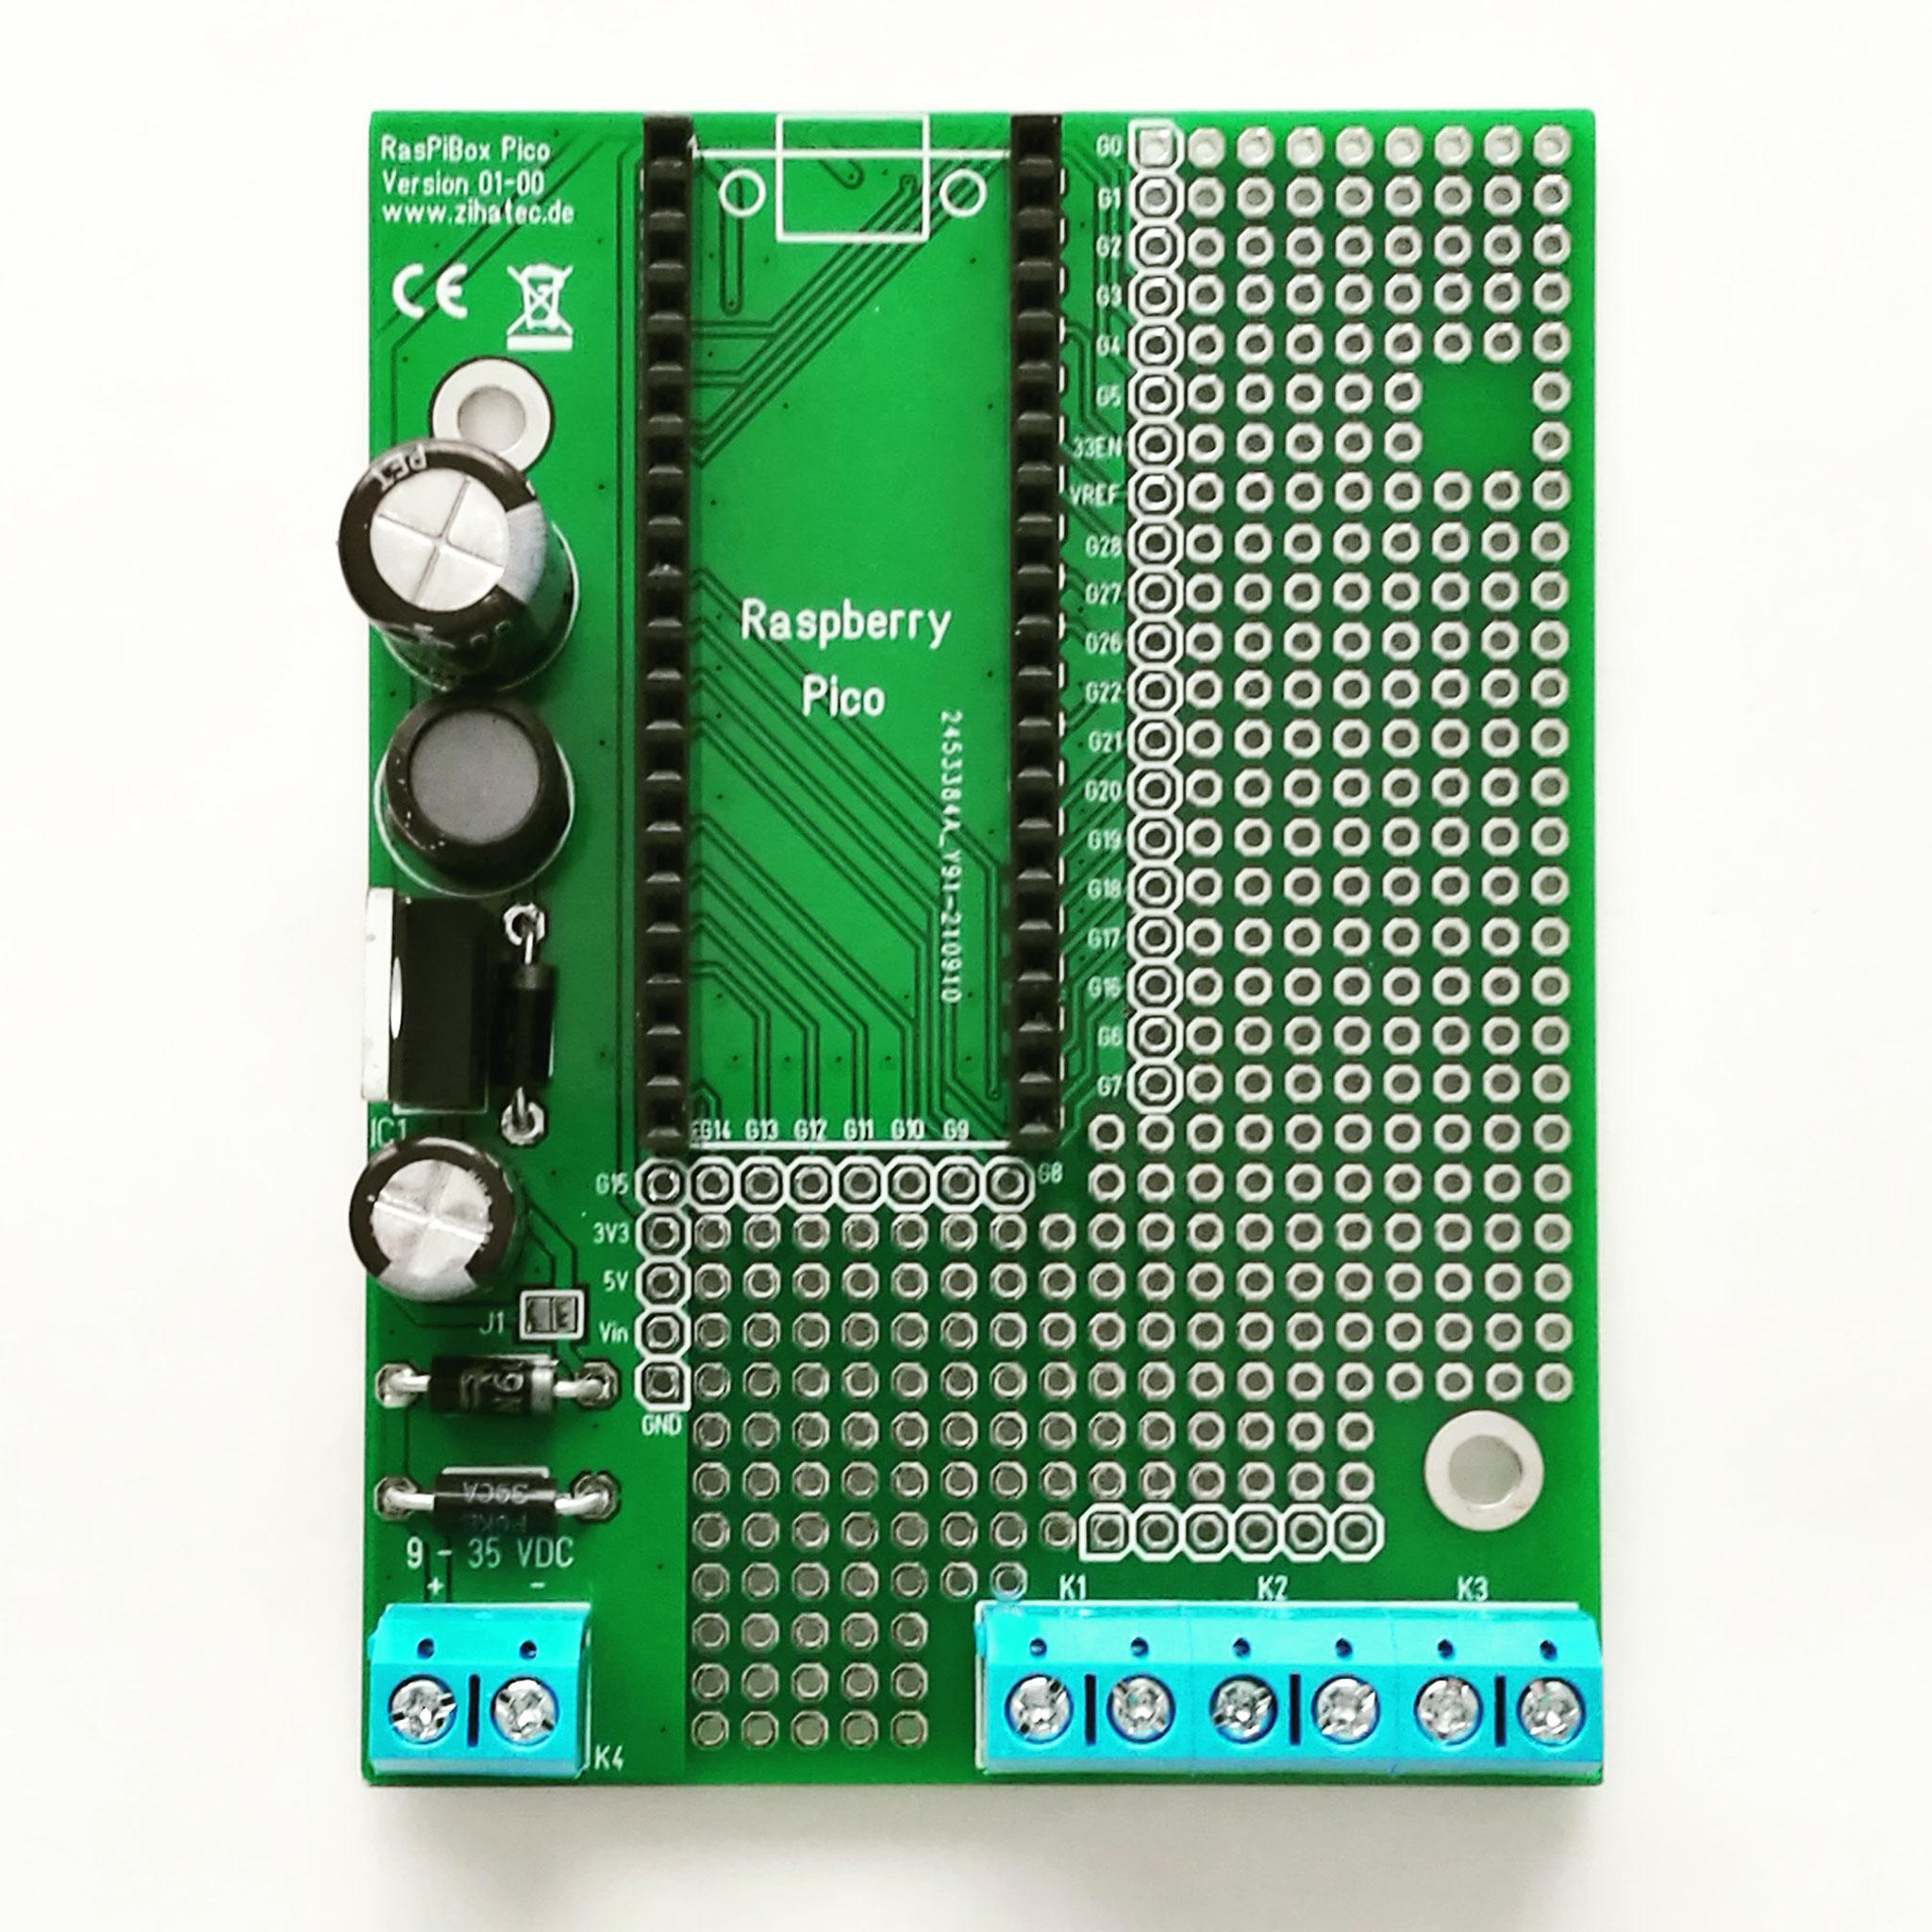 RasPiBox Pico Leiterplatte bestückt